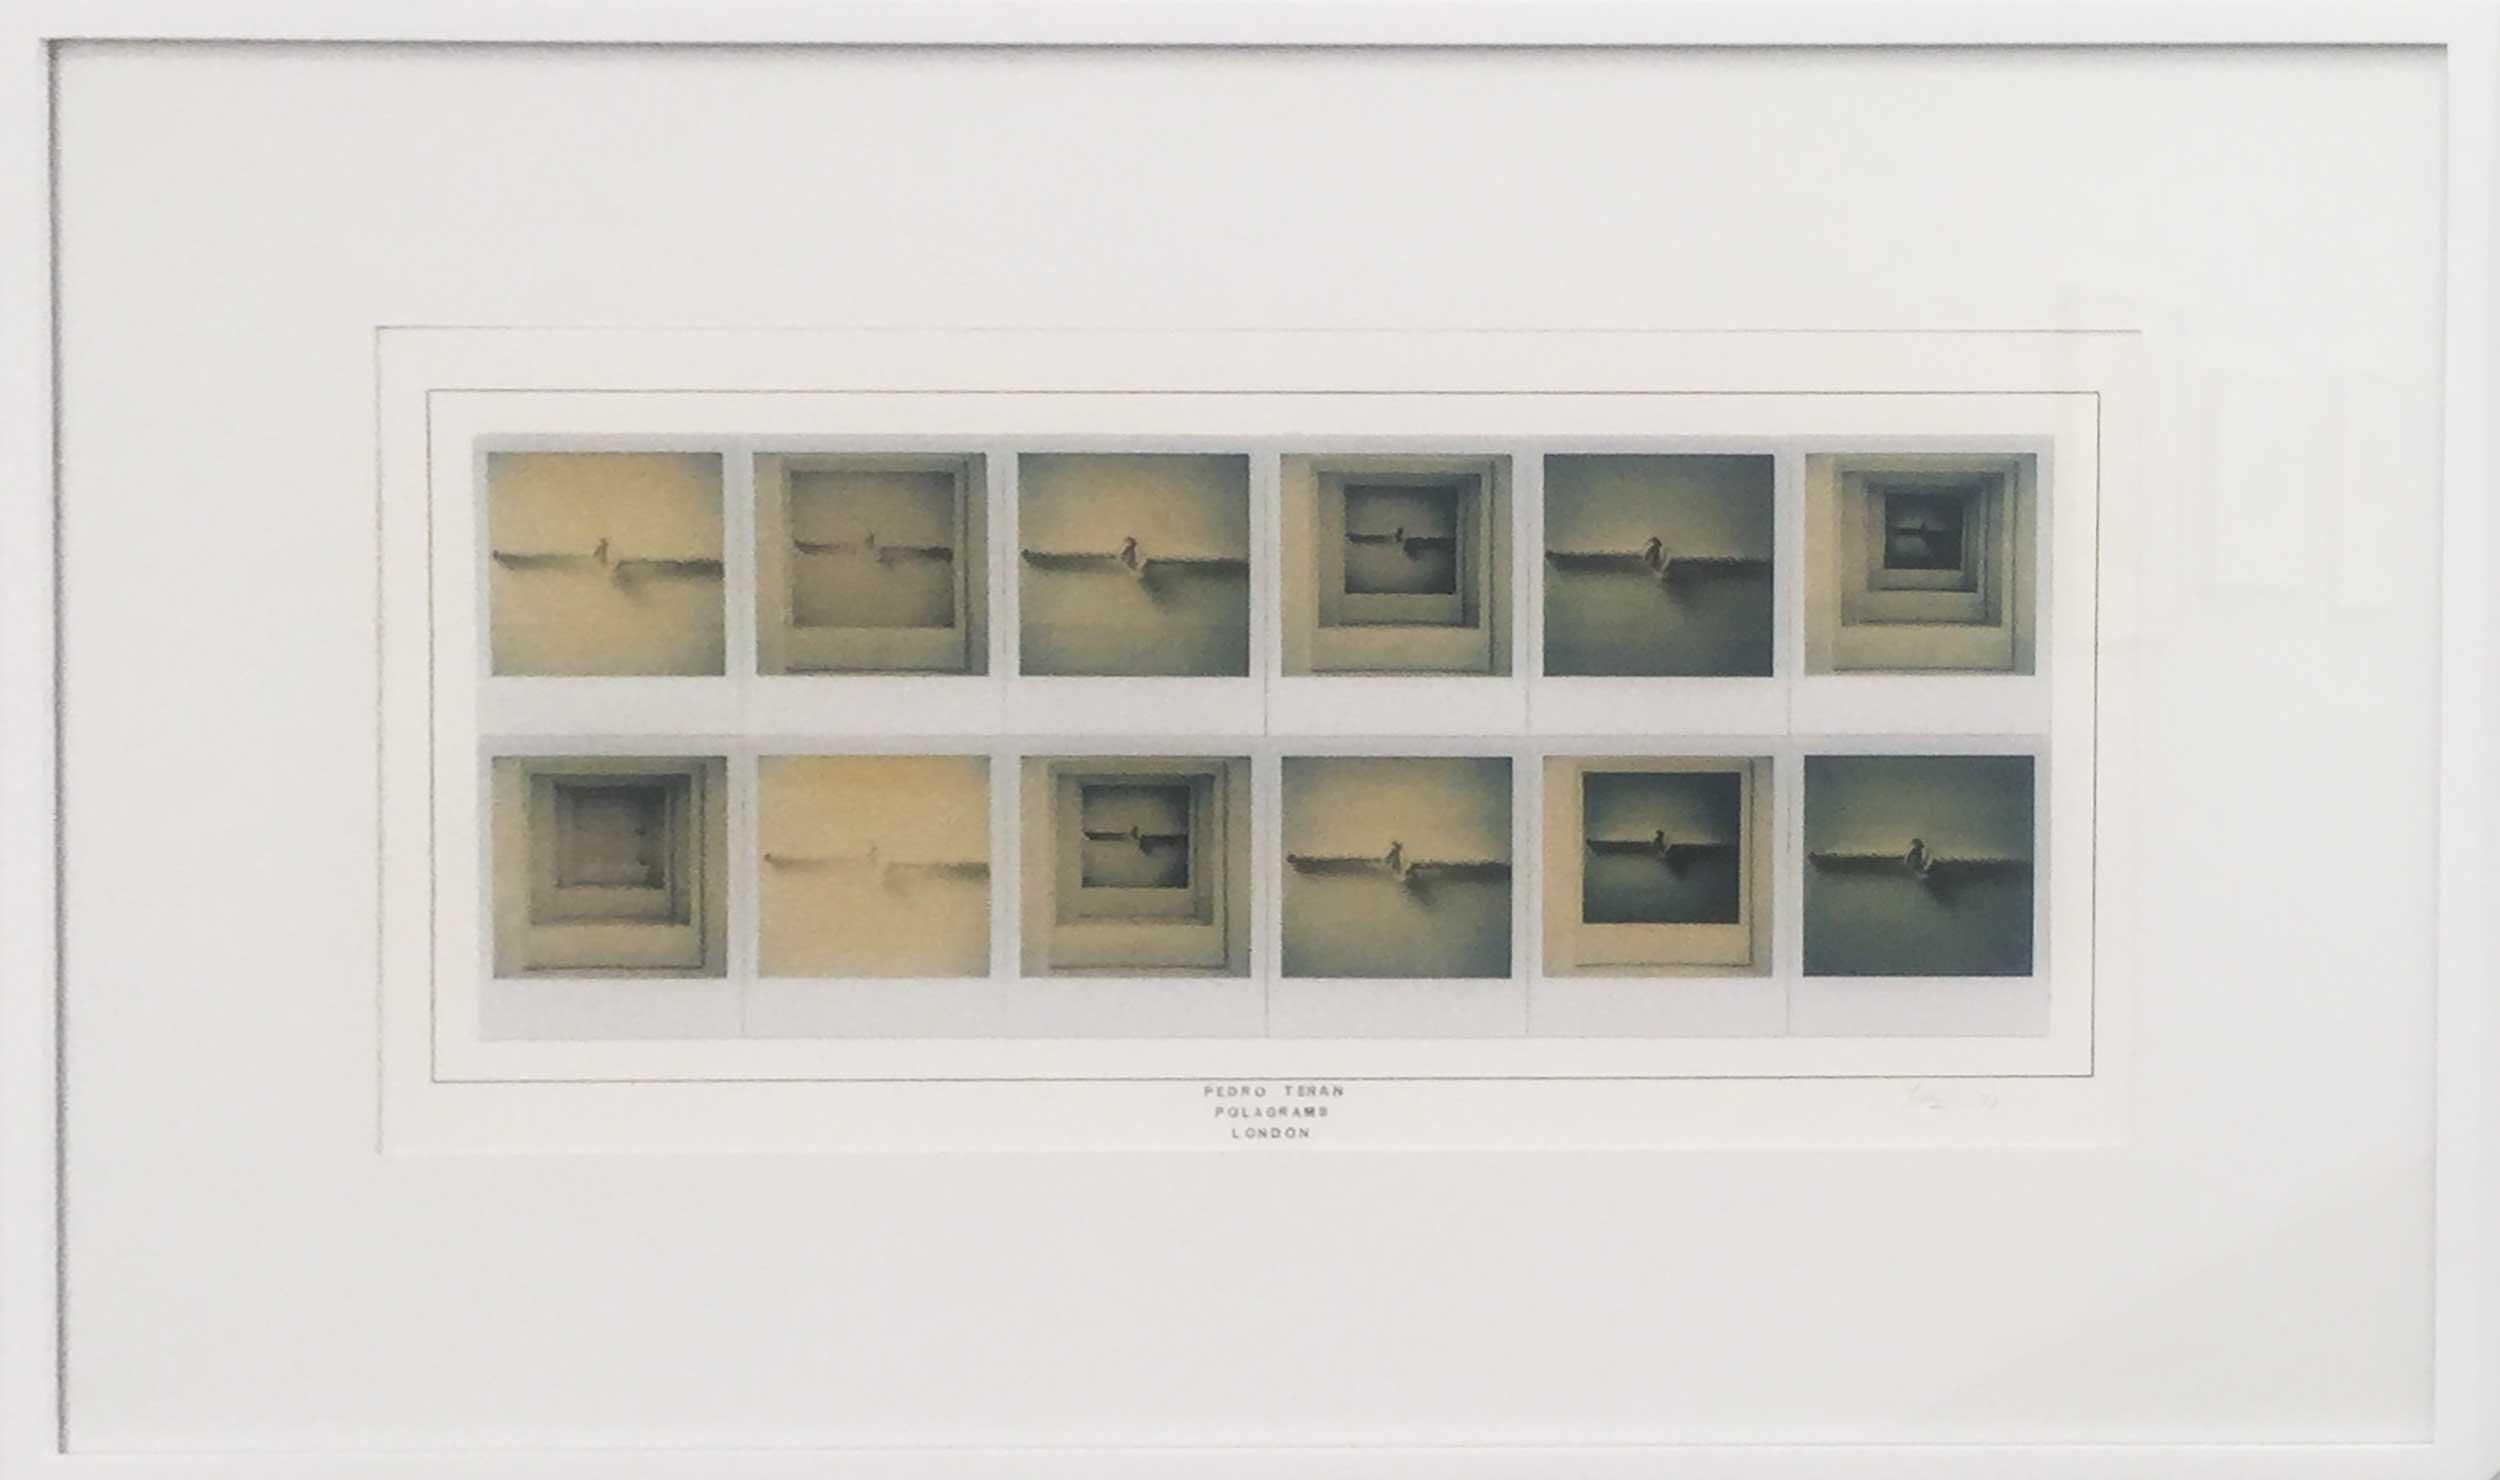 Pedro Terán, Pologramas (loop), 1977. Polaroid. Vintage. 51 x 81.5 cm. Cortesía: Instituto de Visión, Bogotá, 2016